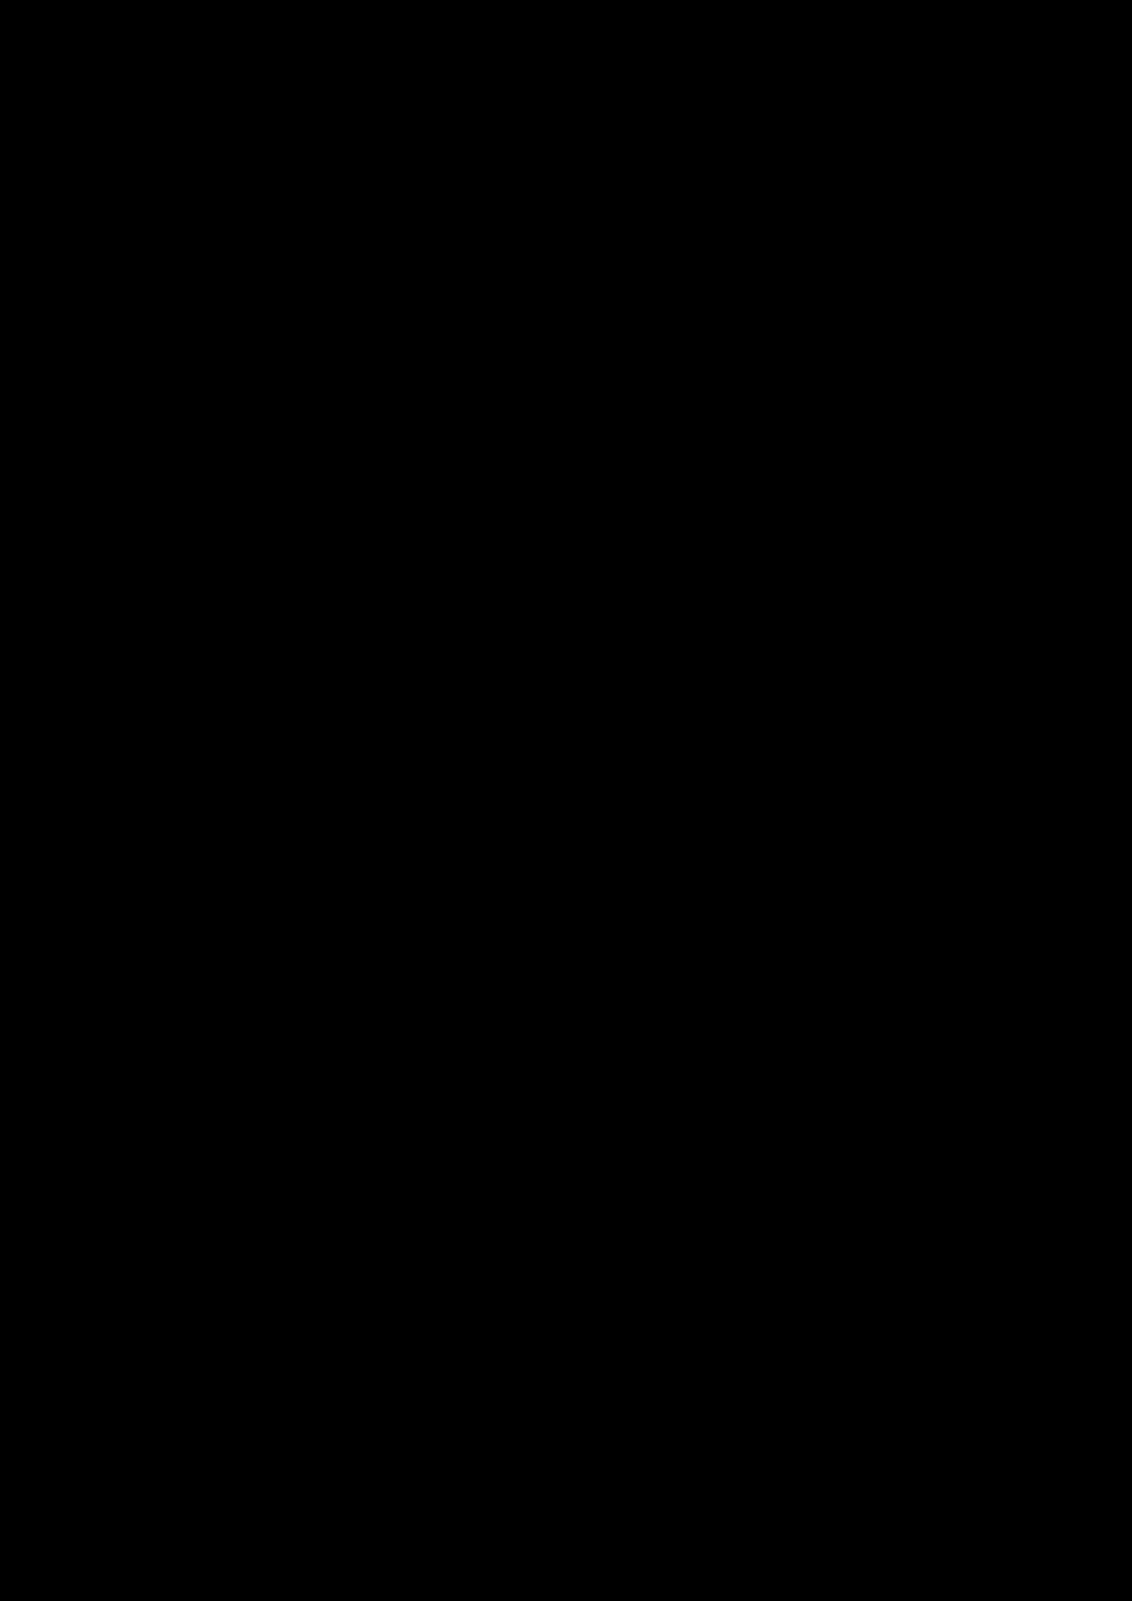 Menshe nas slide, Image 1